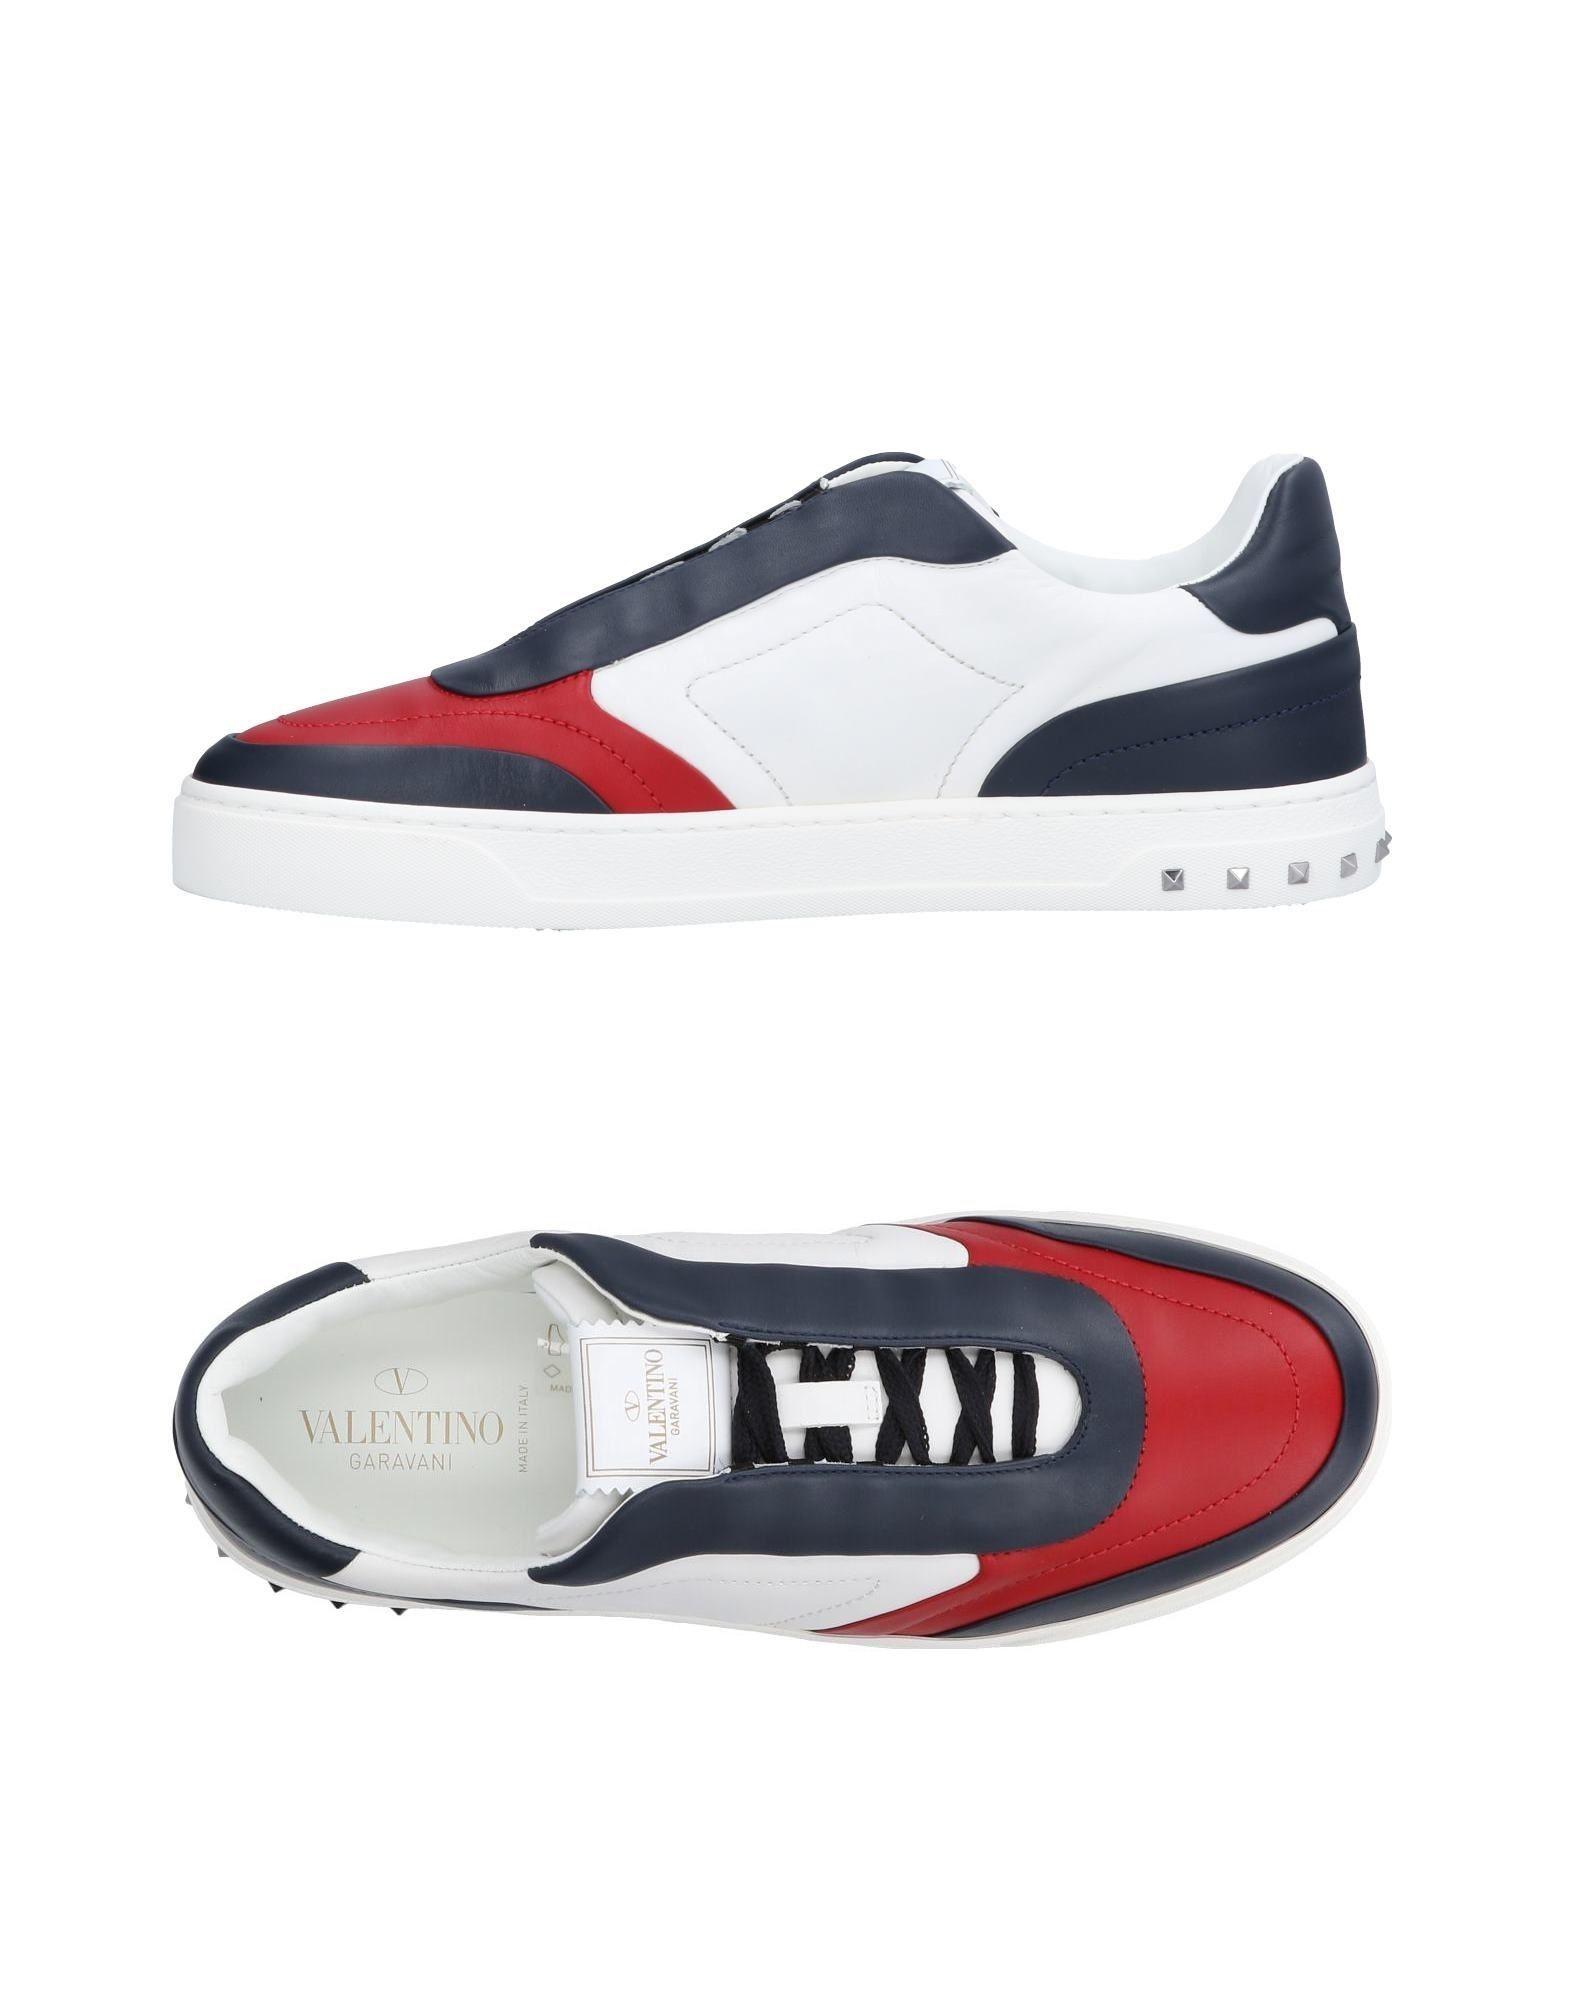 Valentino Garavani Sneakers Qualität Herren  11500071HK Gute Qualität Sneakers beliebte Schuhe 20f7b5